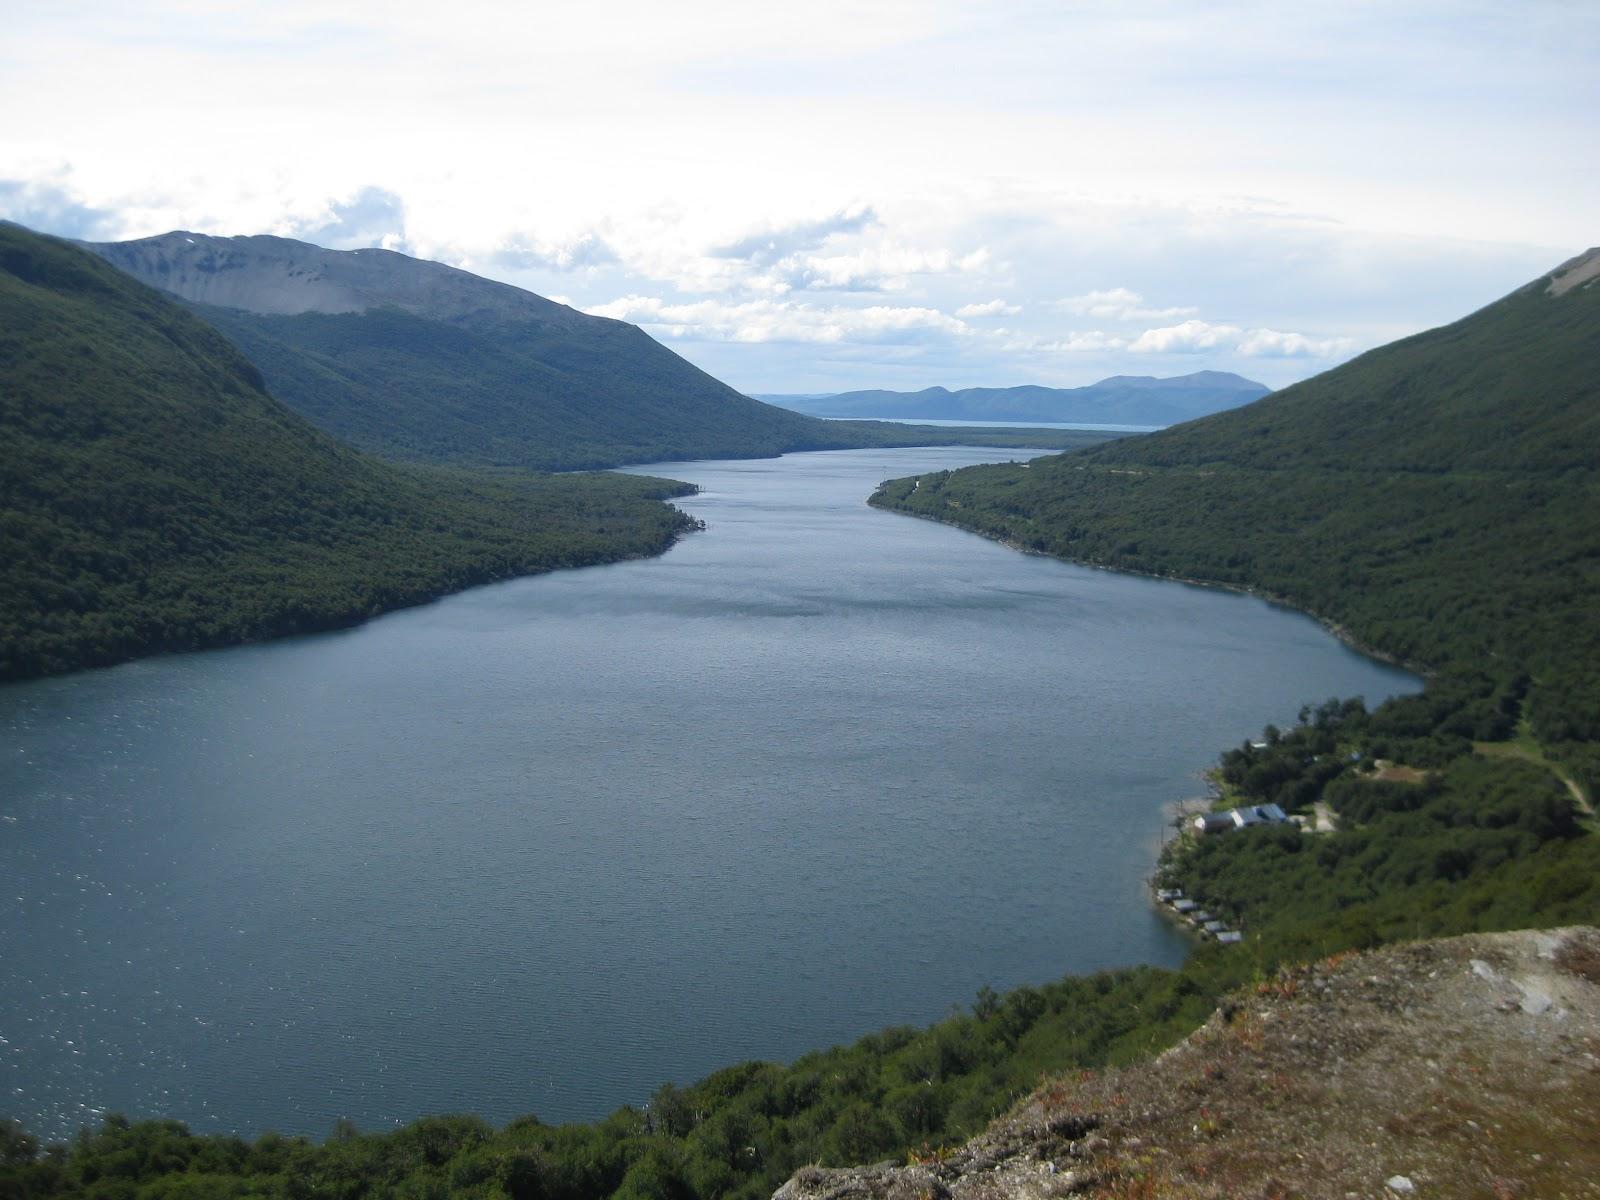 Lago Escondido